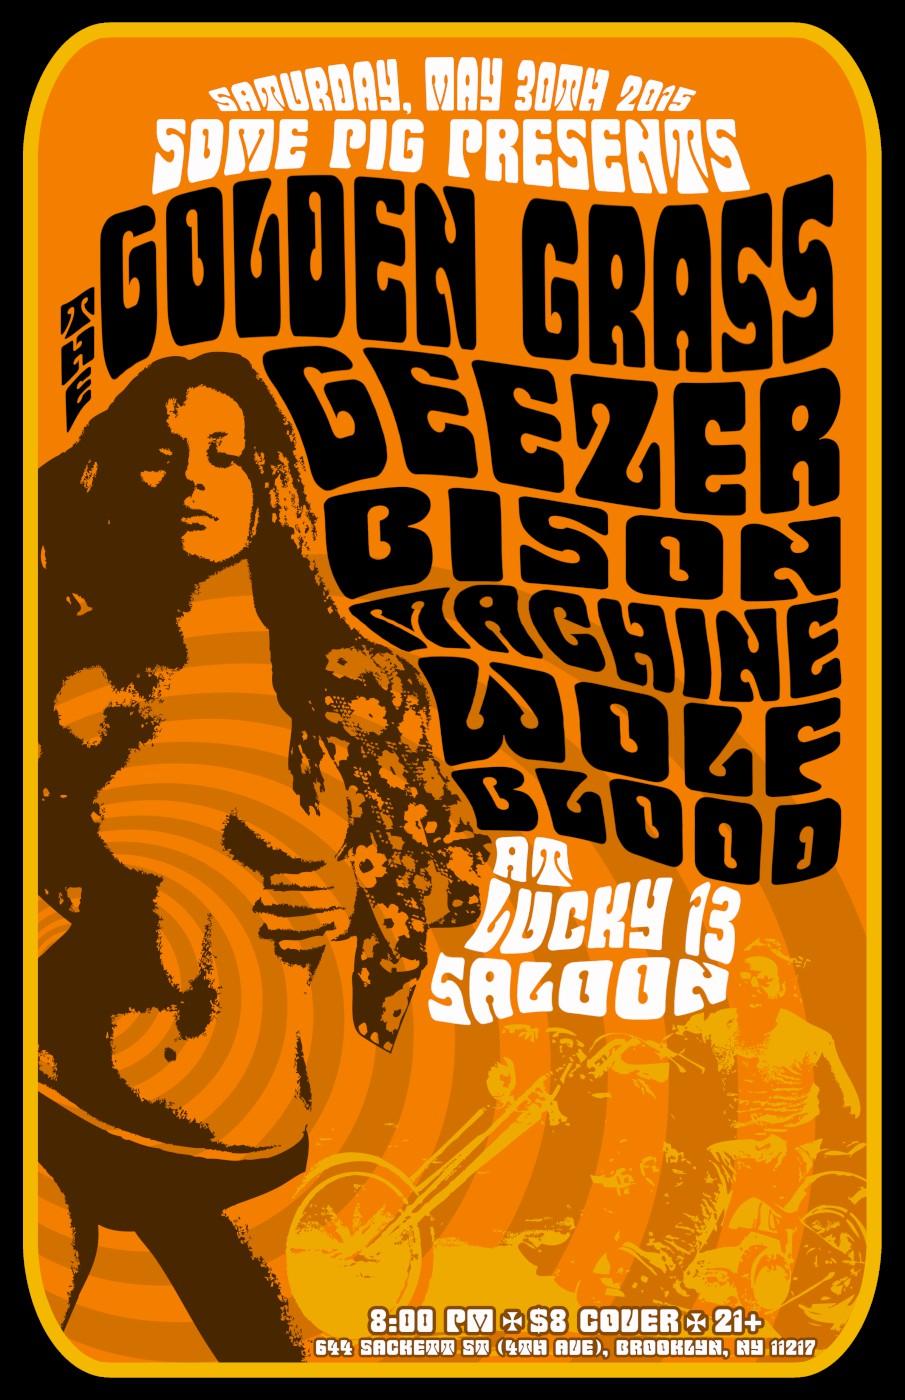 geezer brooklyn show poster